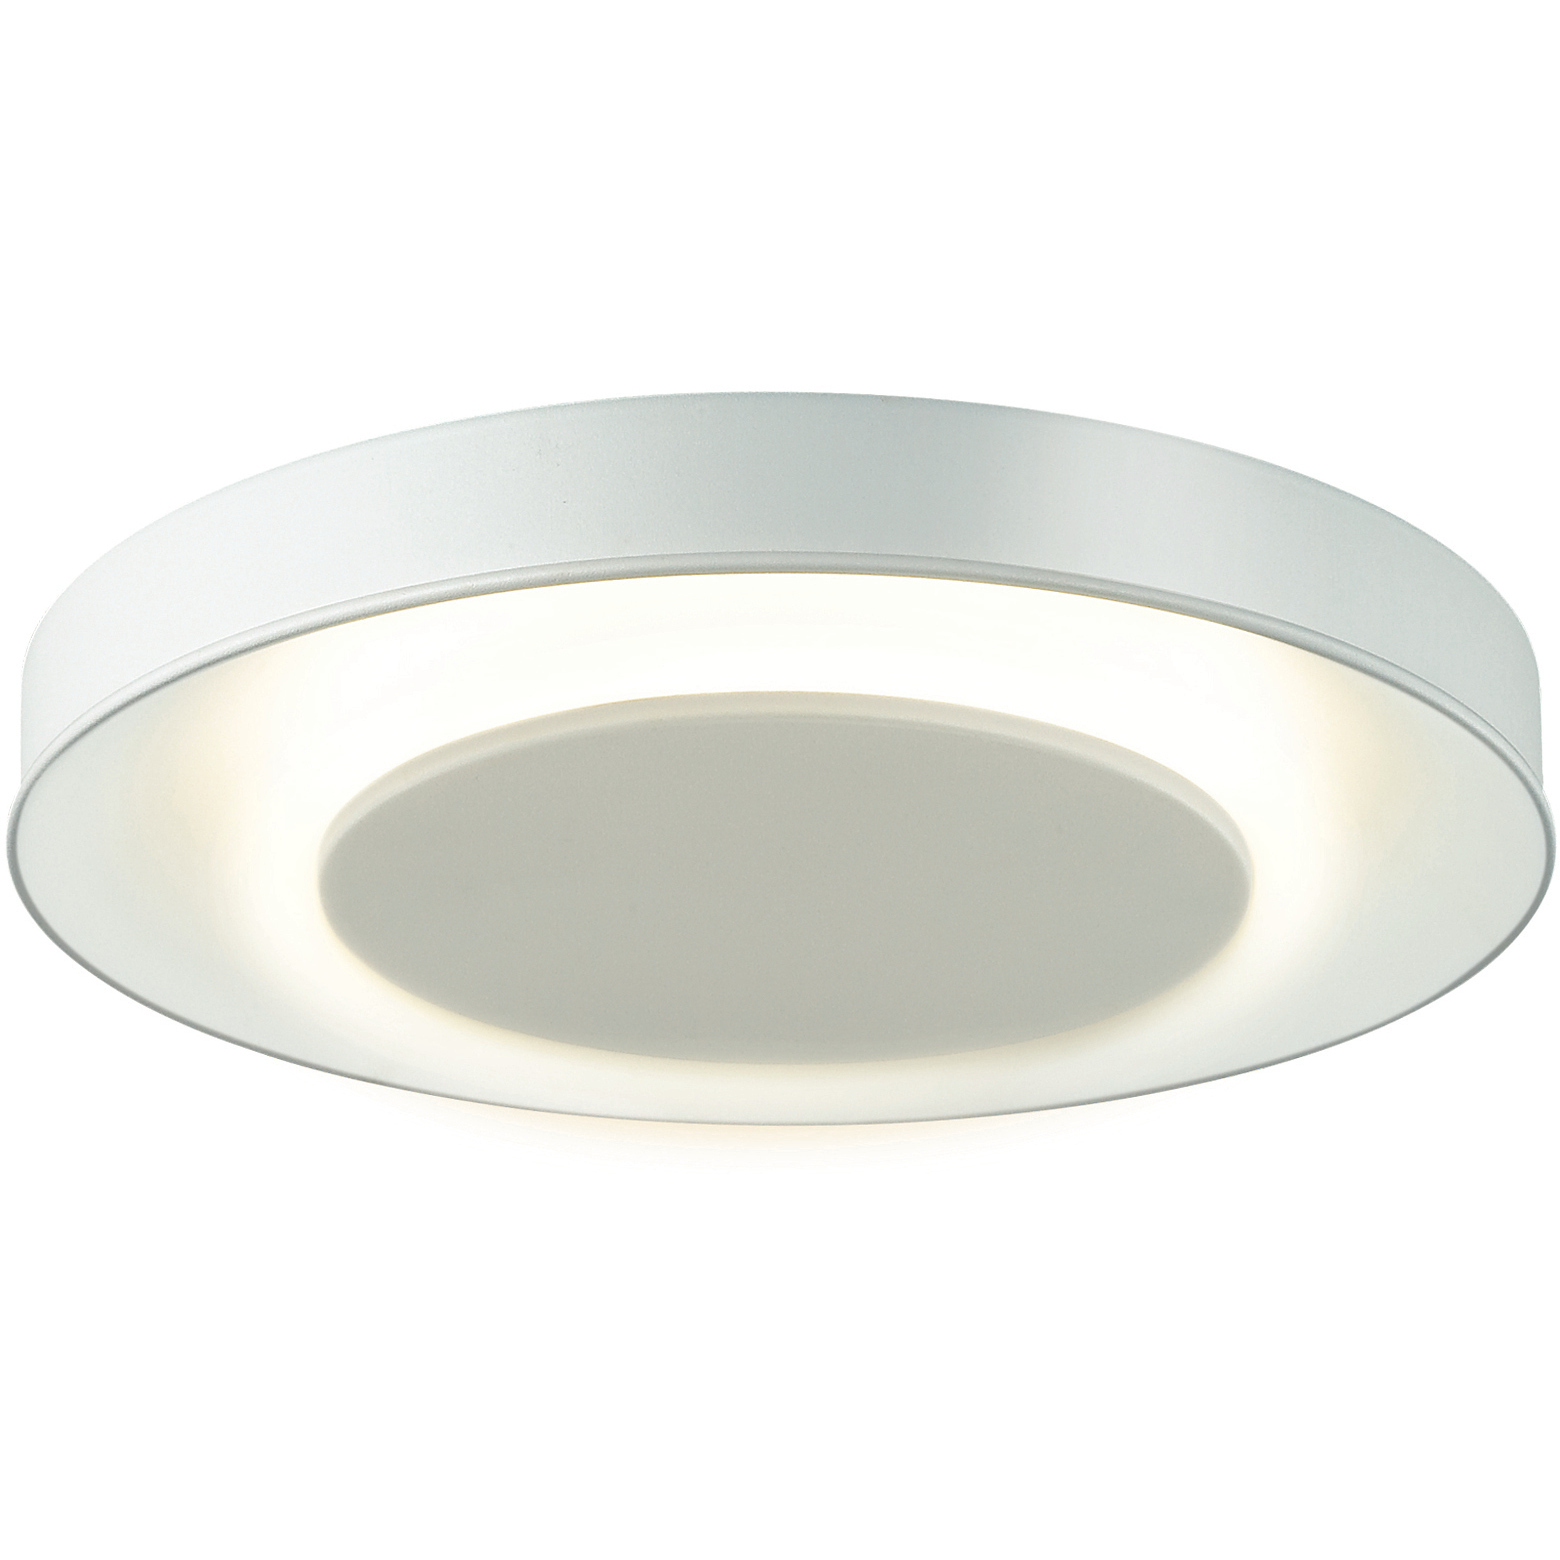 Halo Flush Mount Ceiling Wall Light